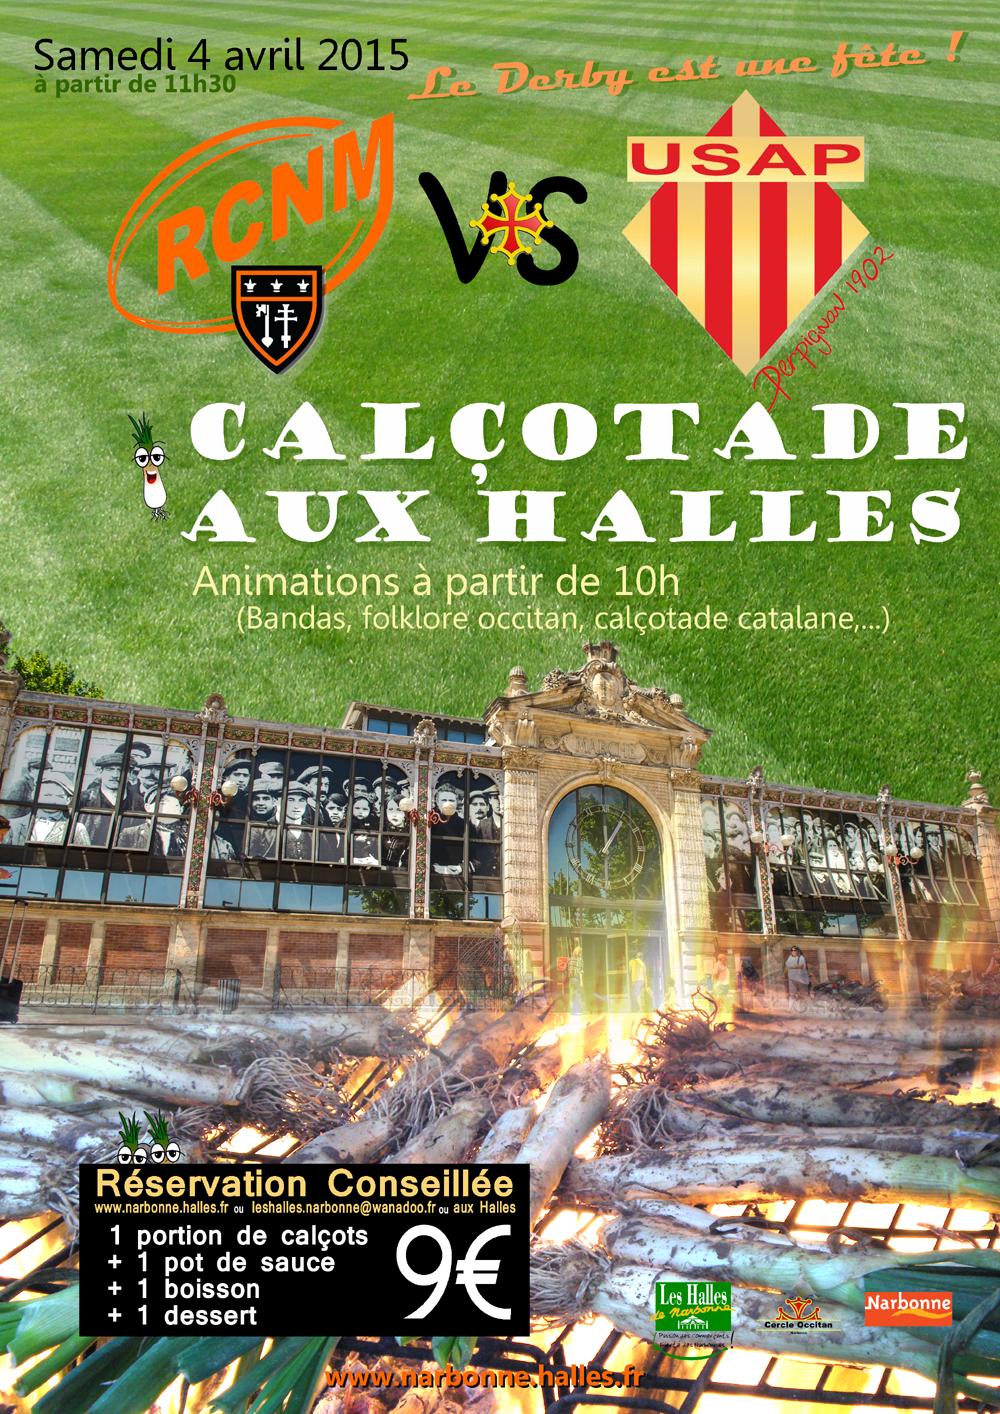 halles narbonne calotade derby rugby rcnm usap occitan visuel